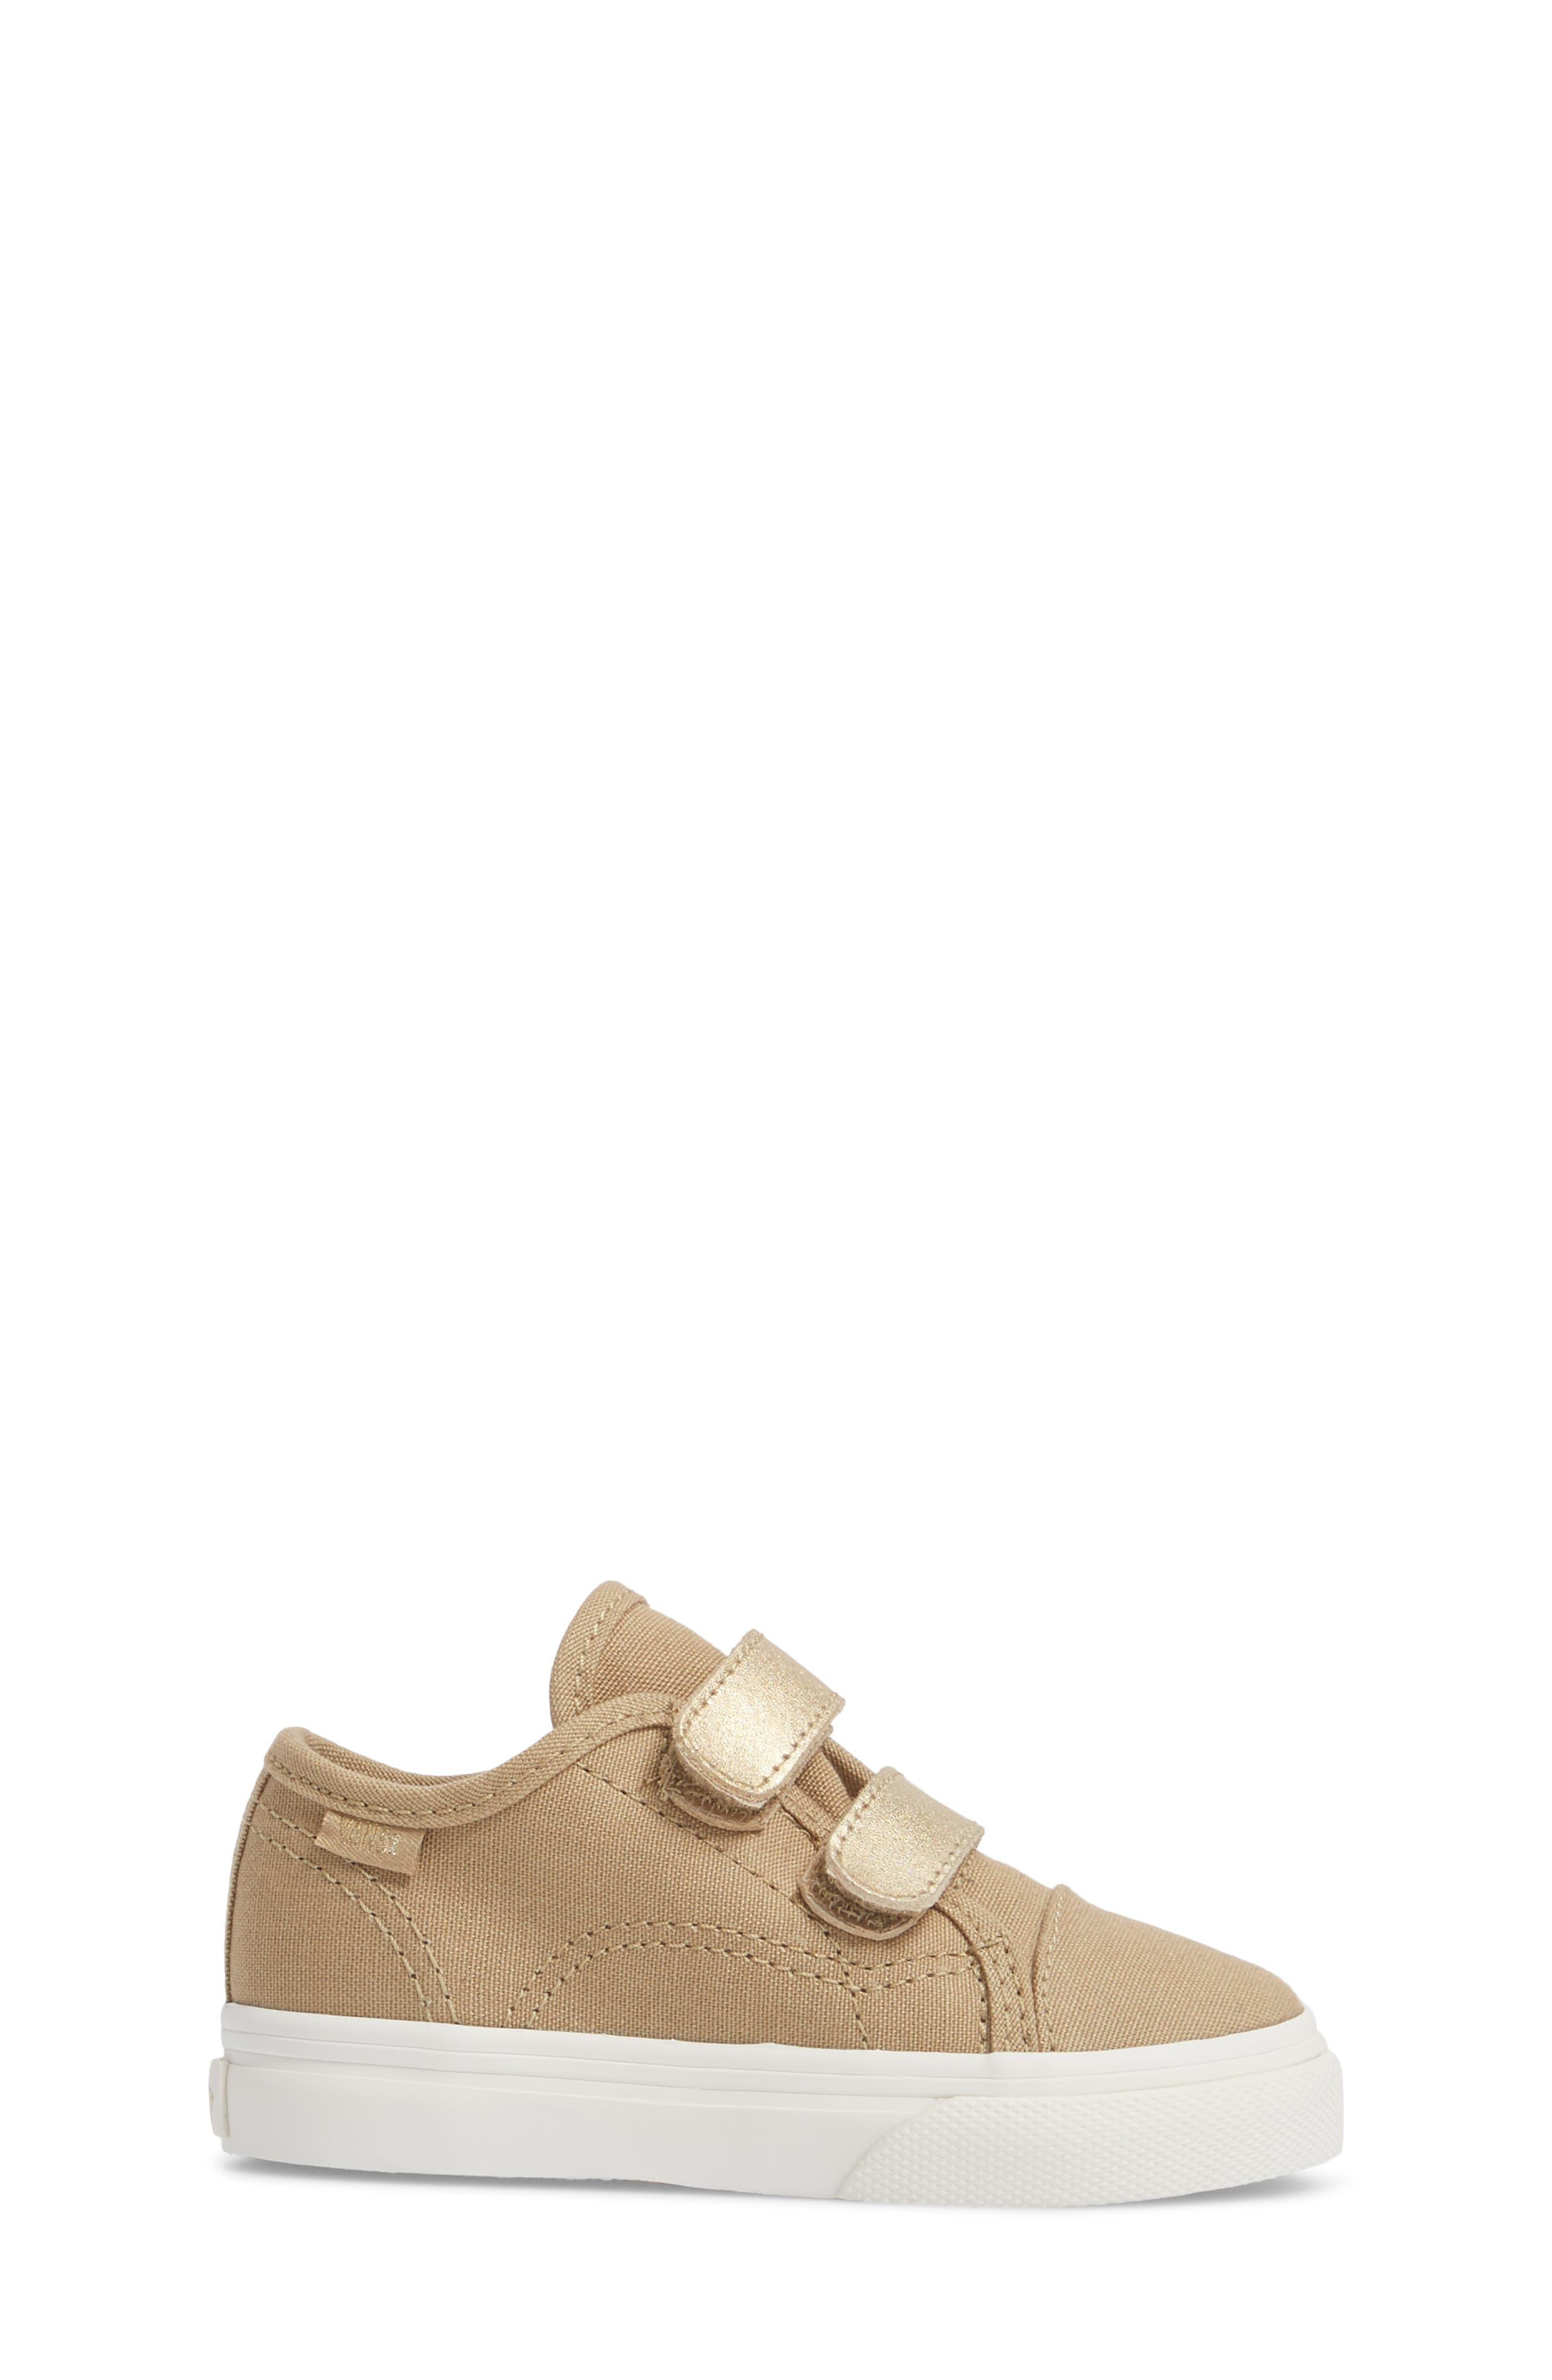 Style 23 V Sneaker,                             Alternate thumbnail 3, color,                             Metallic/ Cornstalk